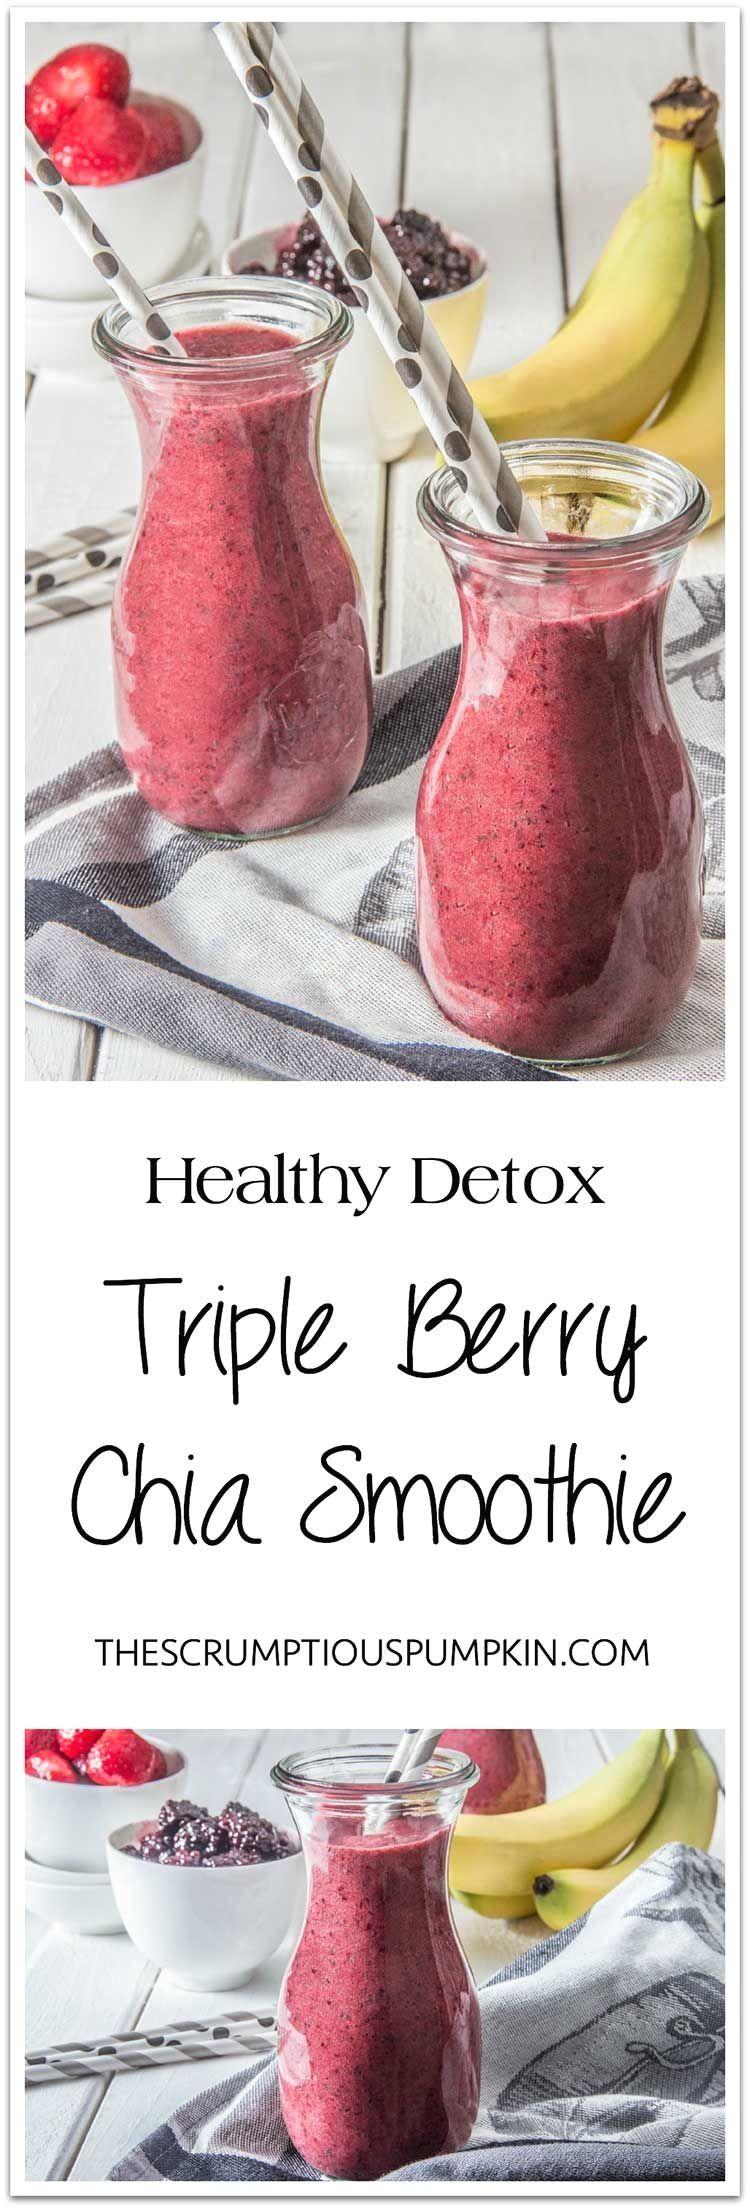 Detox drinks to cleanse detox smoothie recipes detox